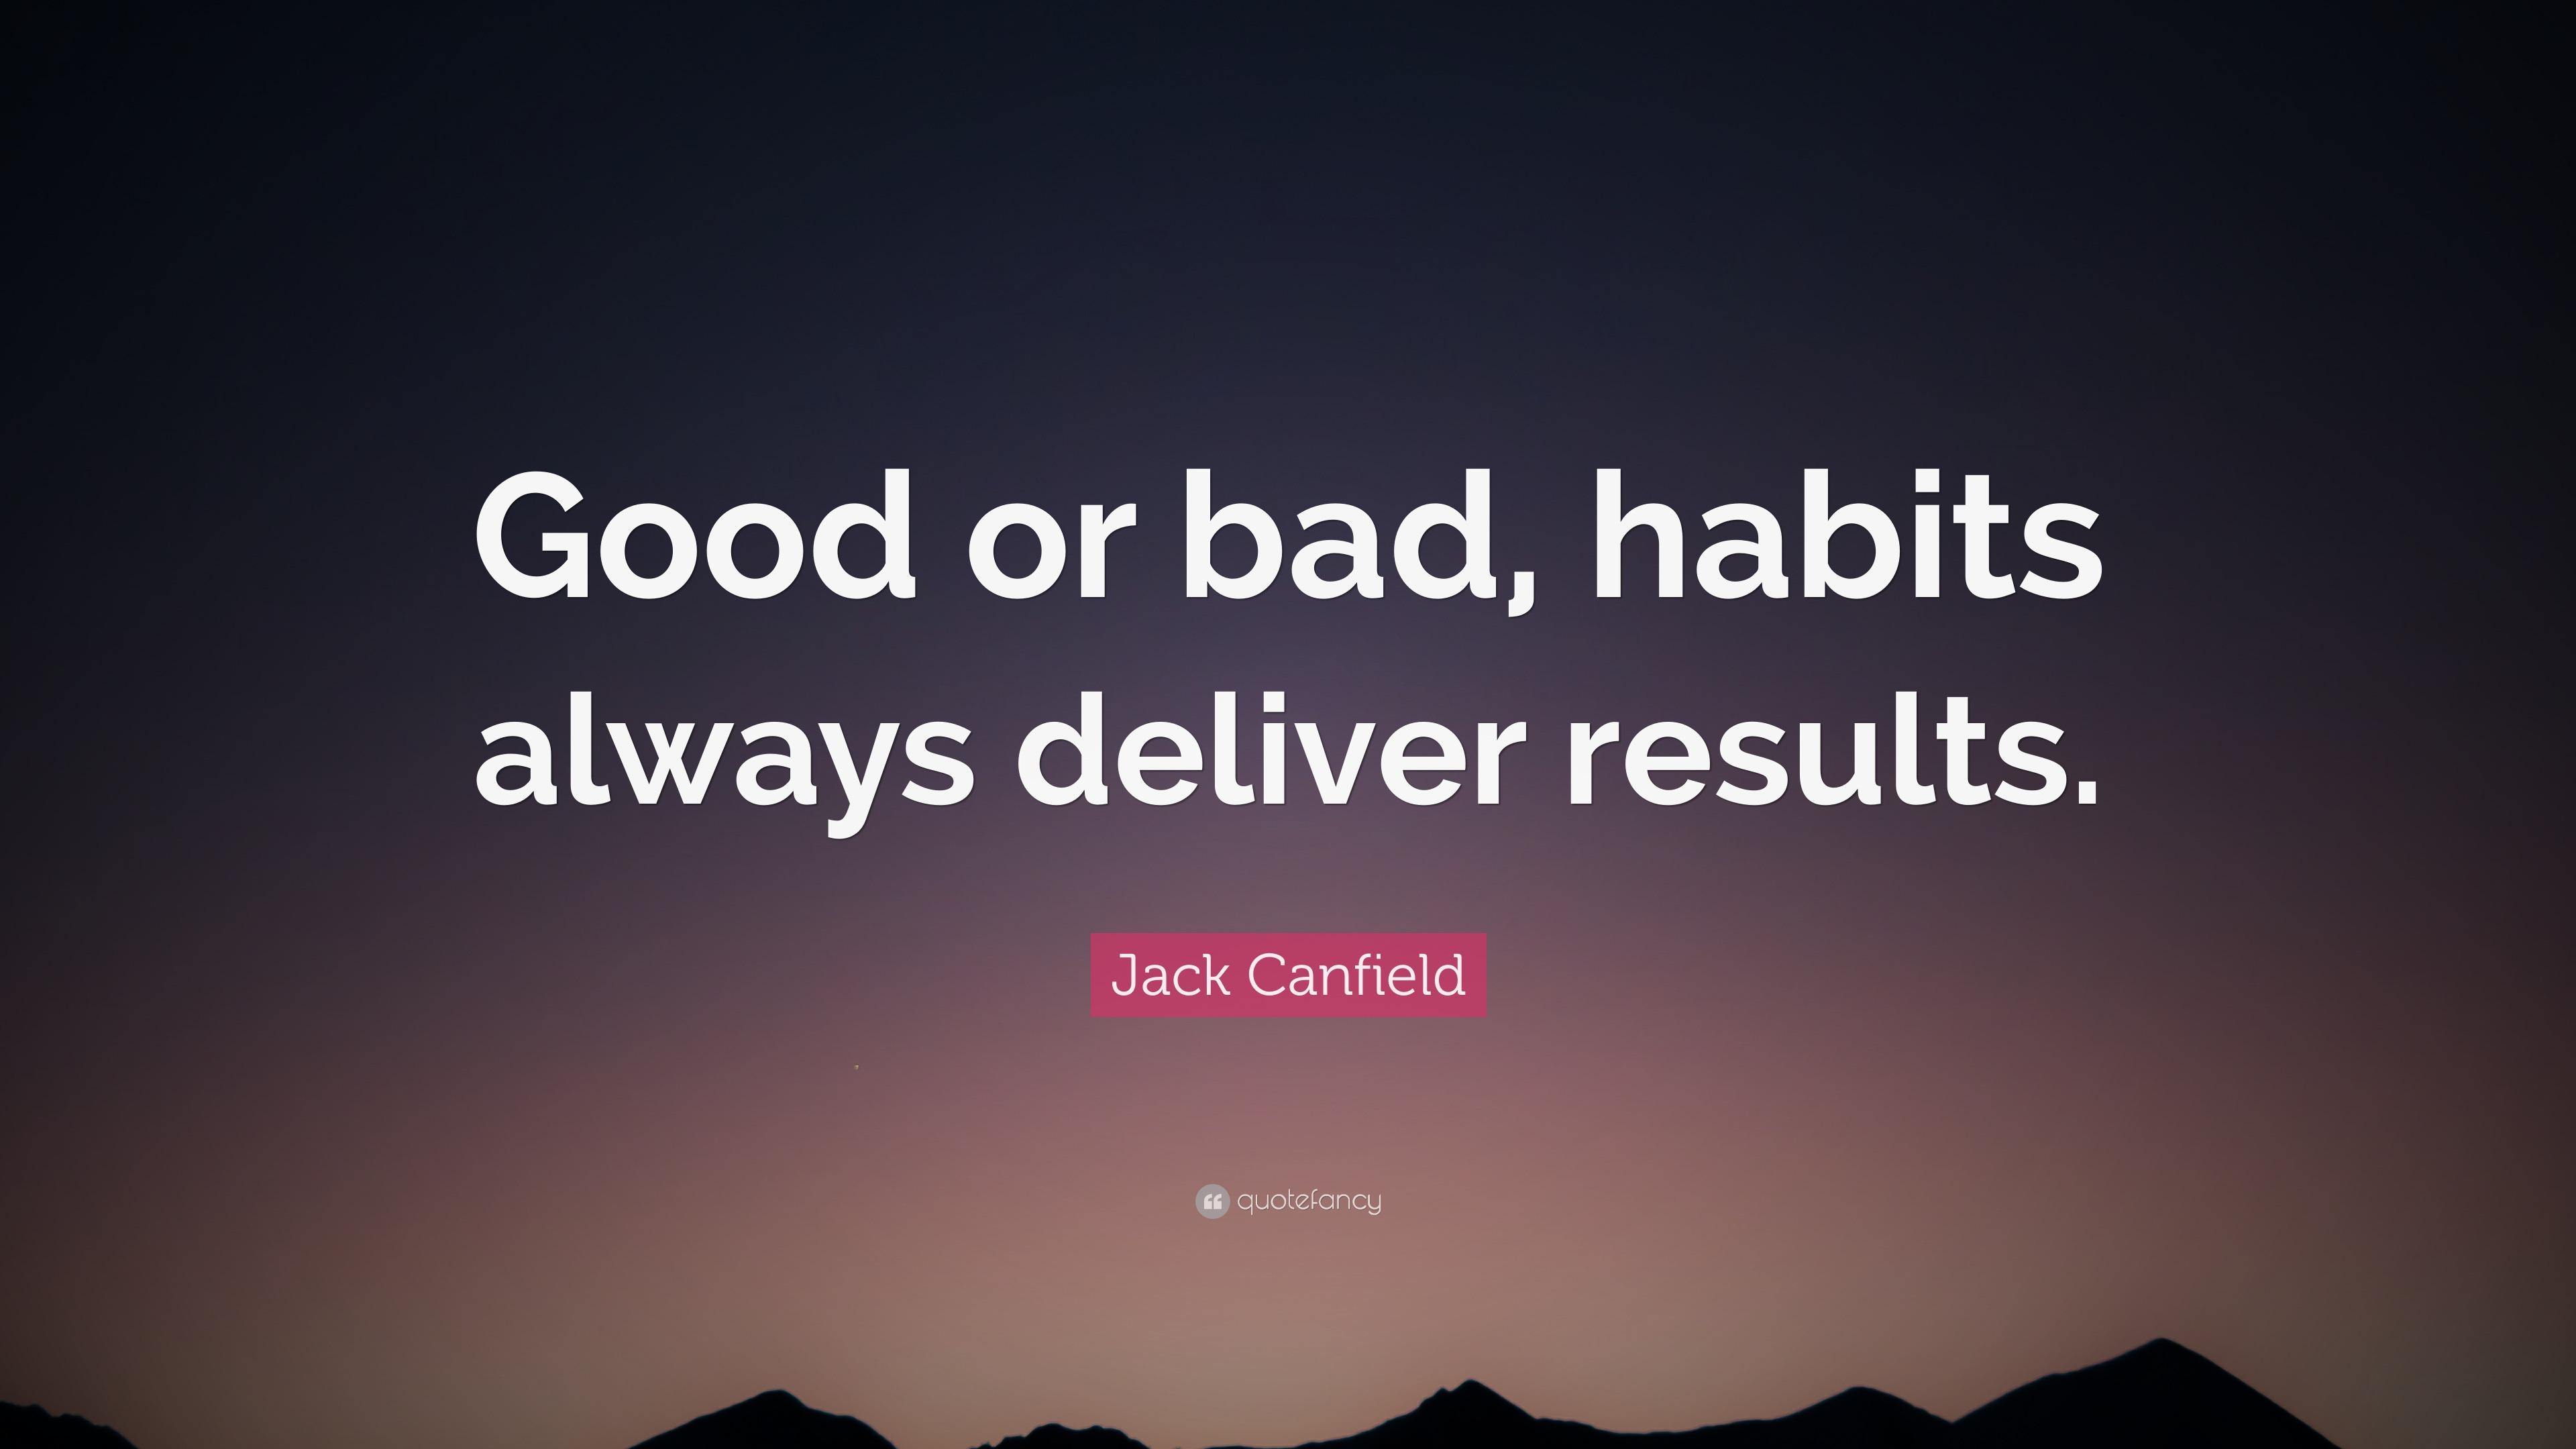 how to break bad habits essay